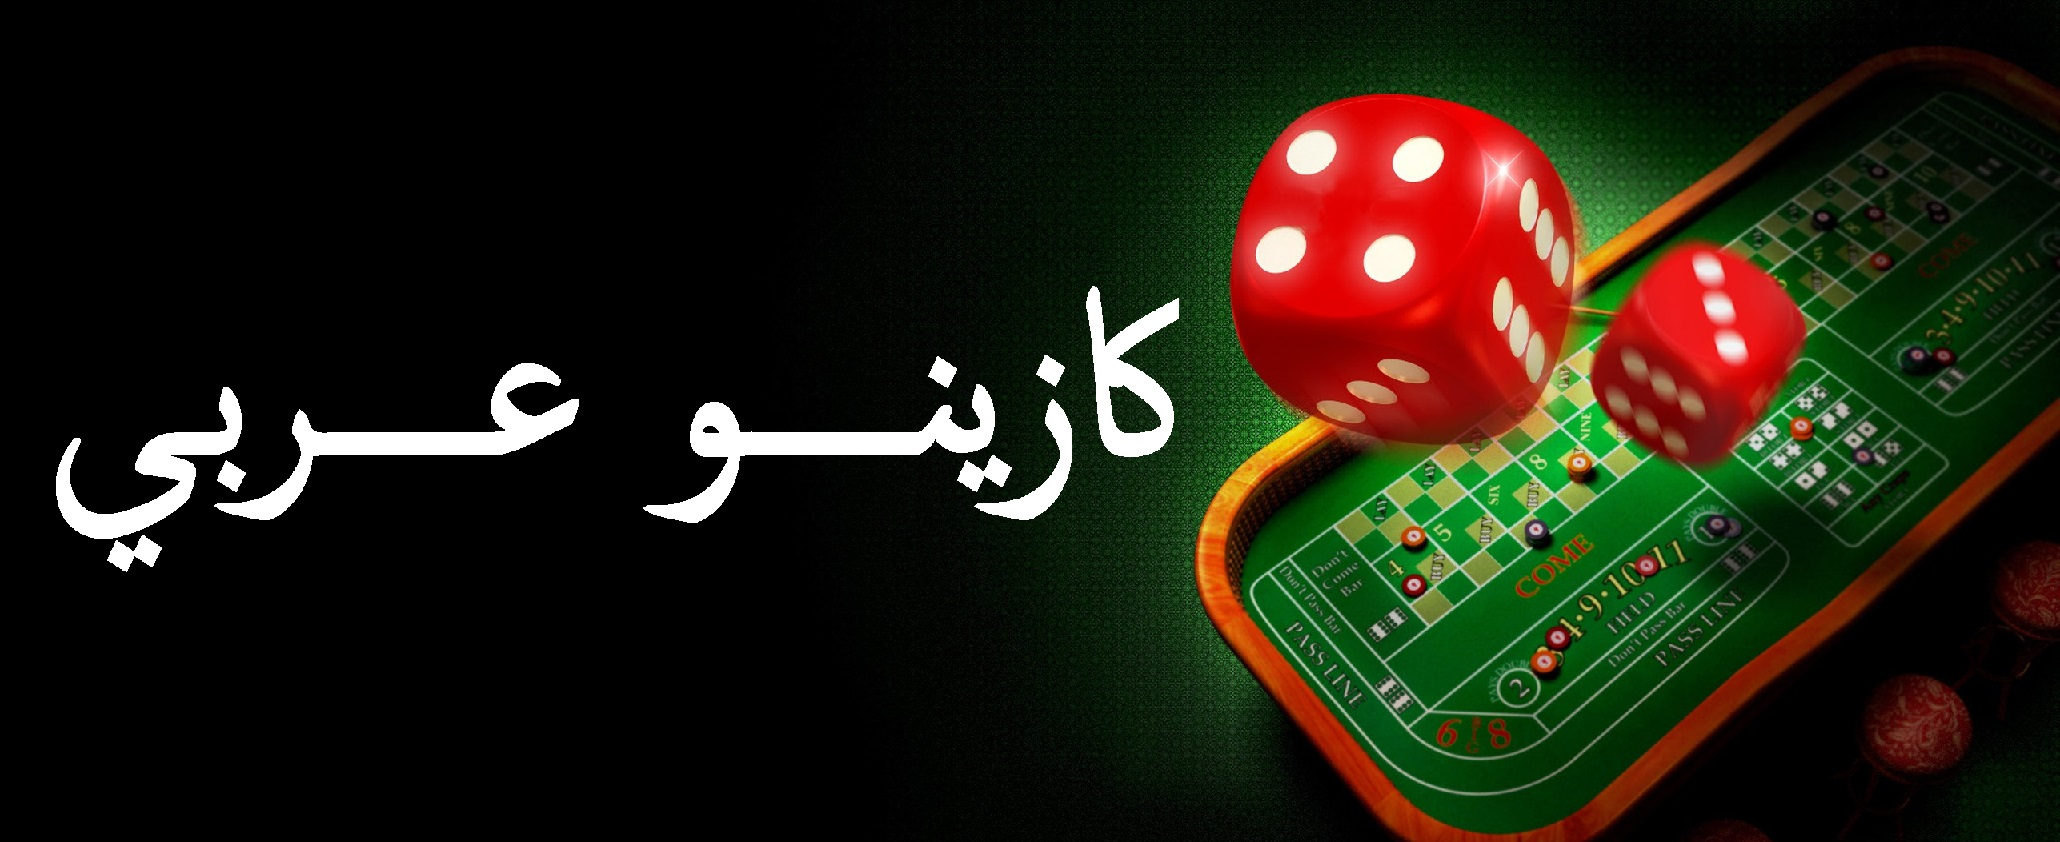 لعبة قمار اون - 53962